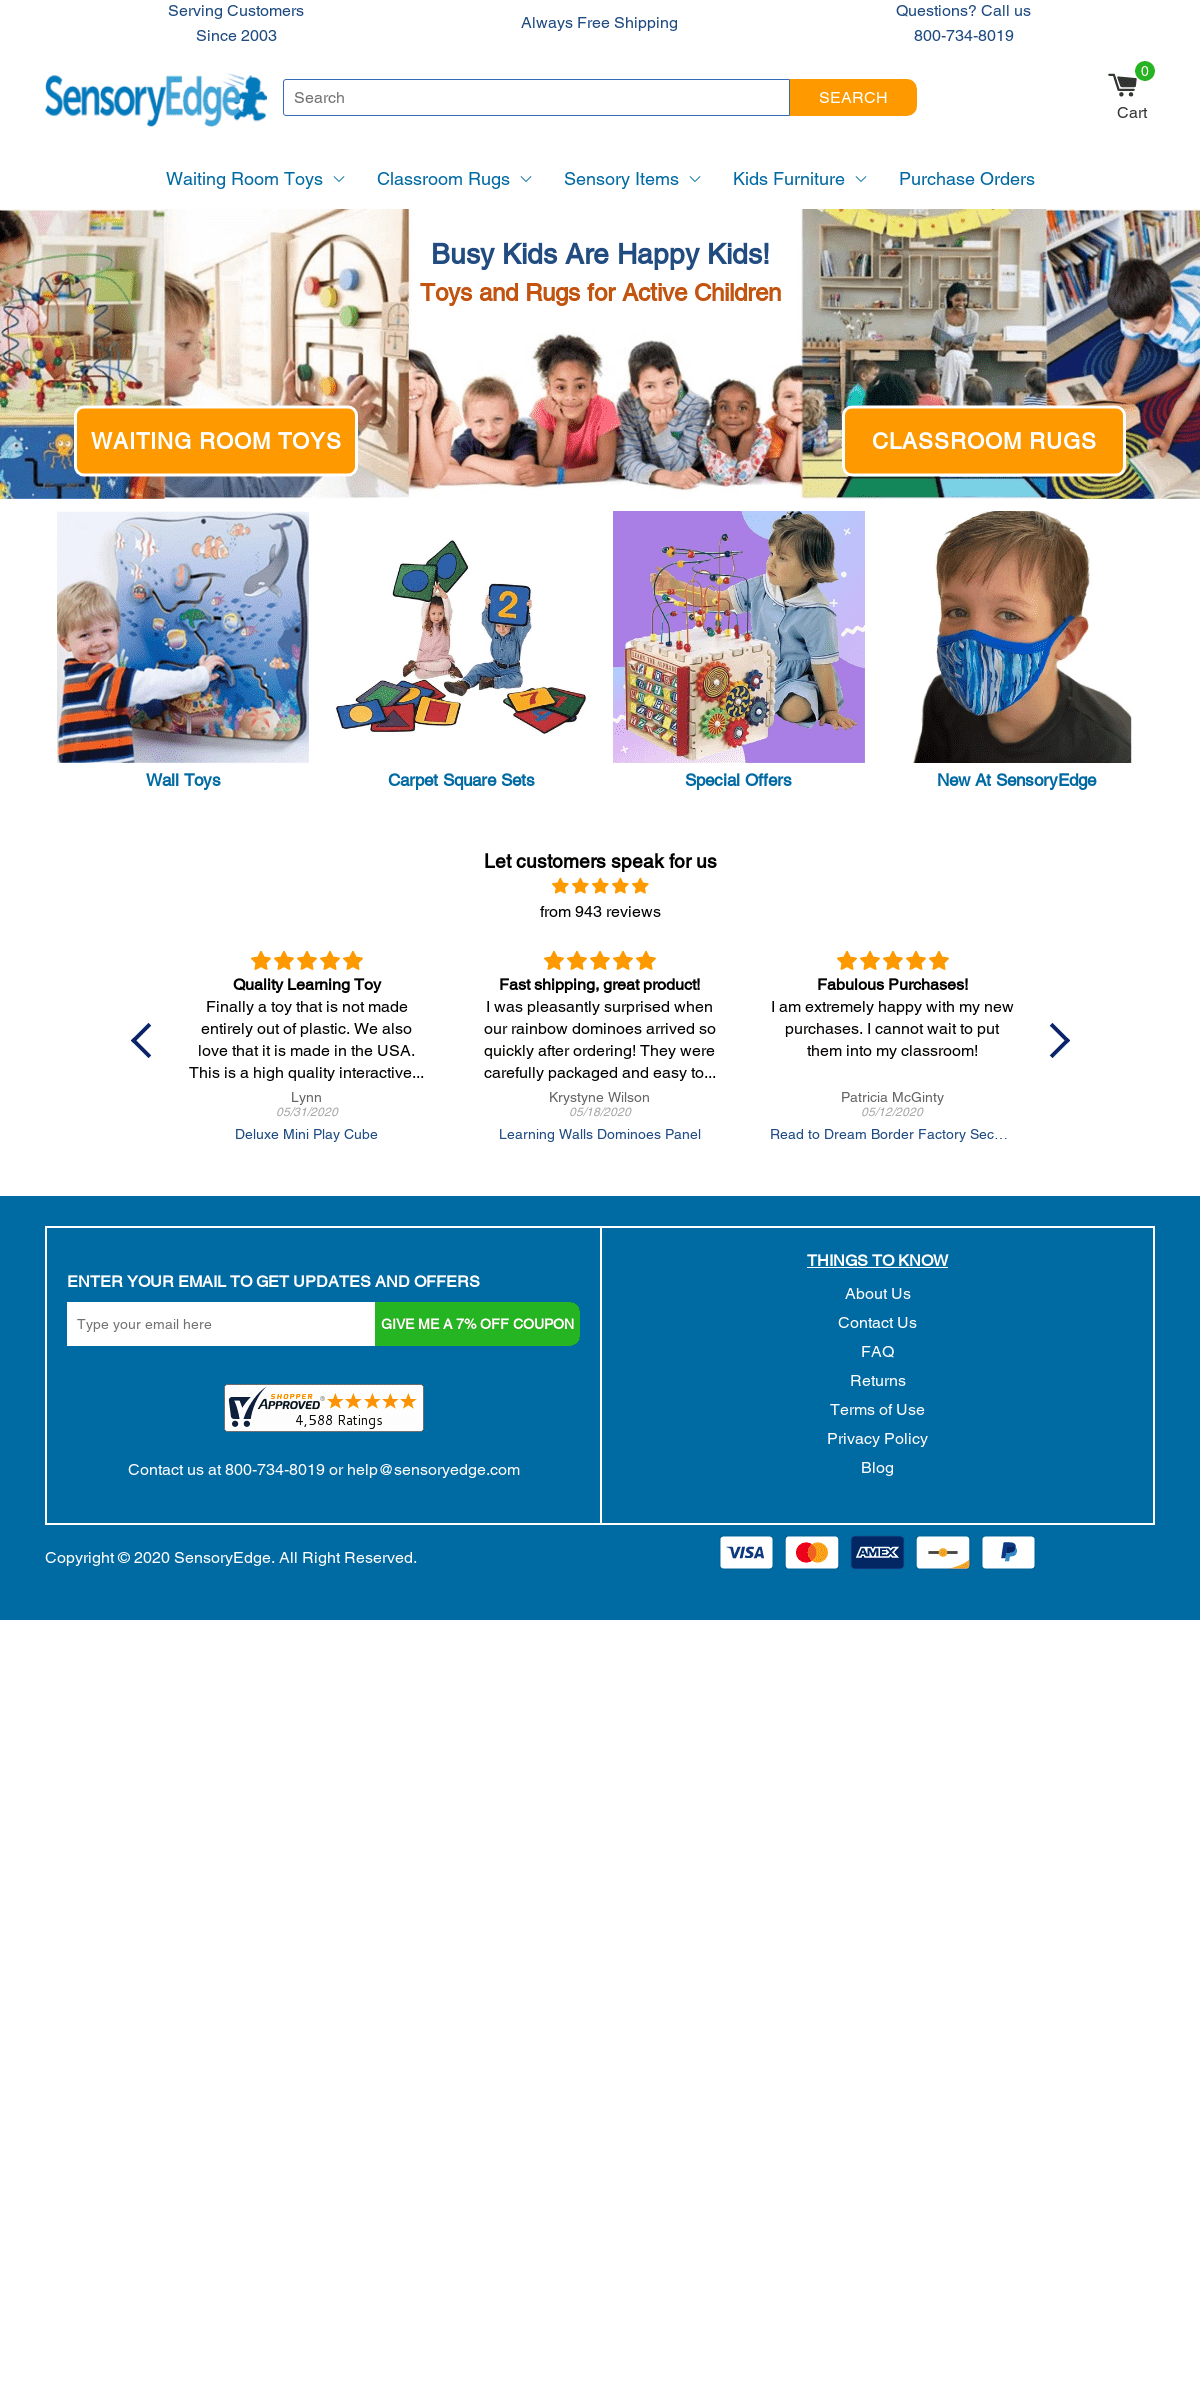 Buy Waiting Room Toys and Classroom Rugs - SensoryEdge